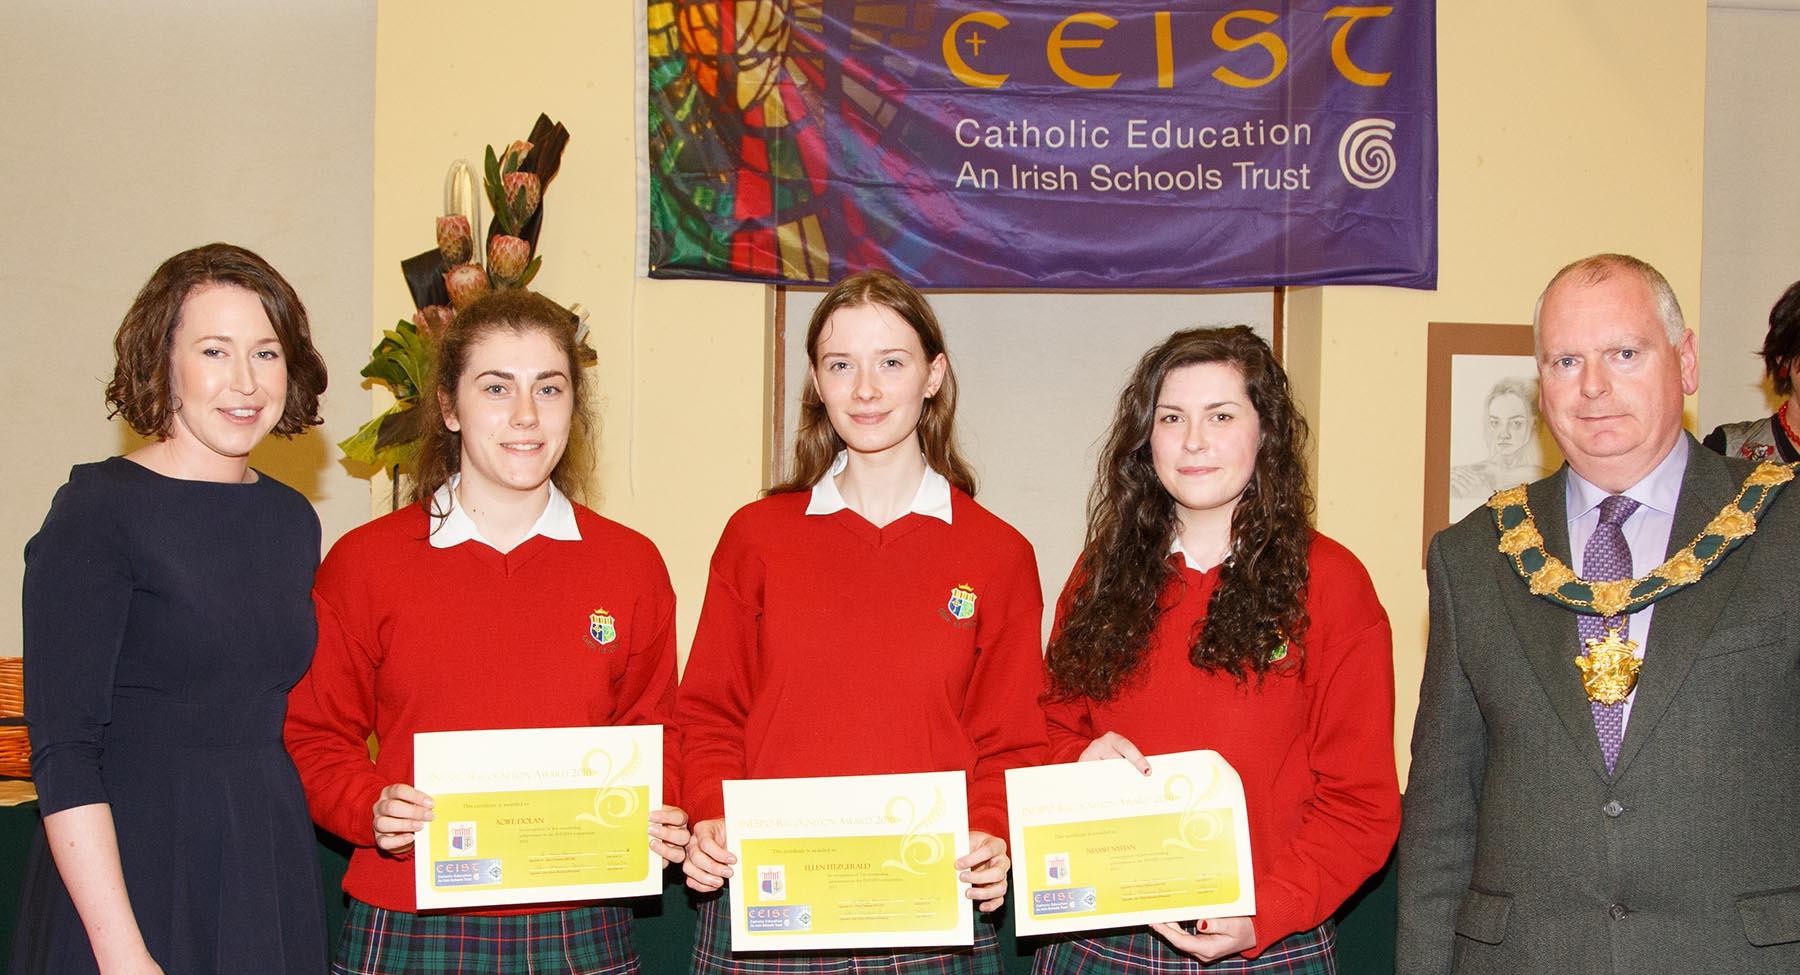 INESPO winners Ellen Fitzgerald, Niamh Nyhan & Aoife Dolan